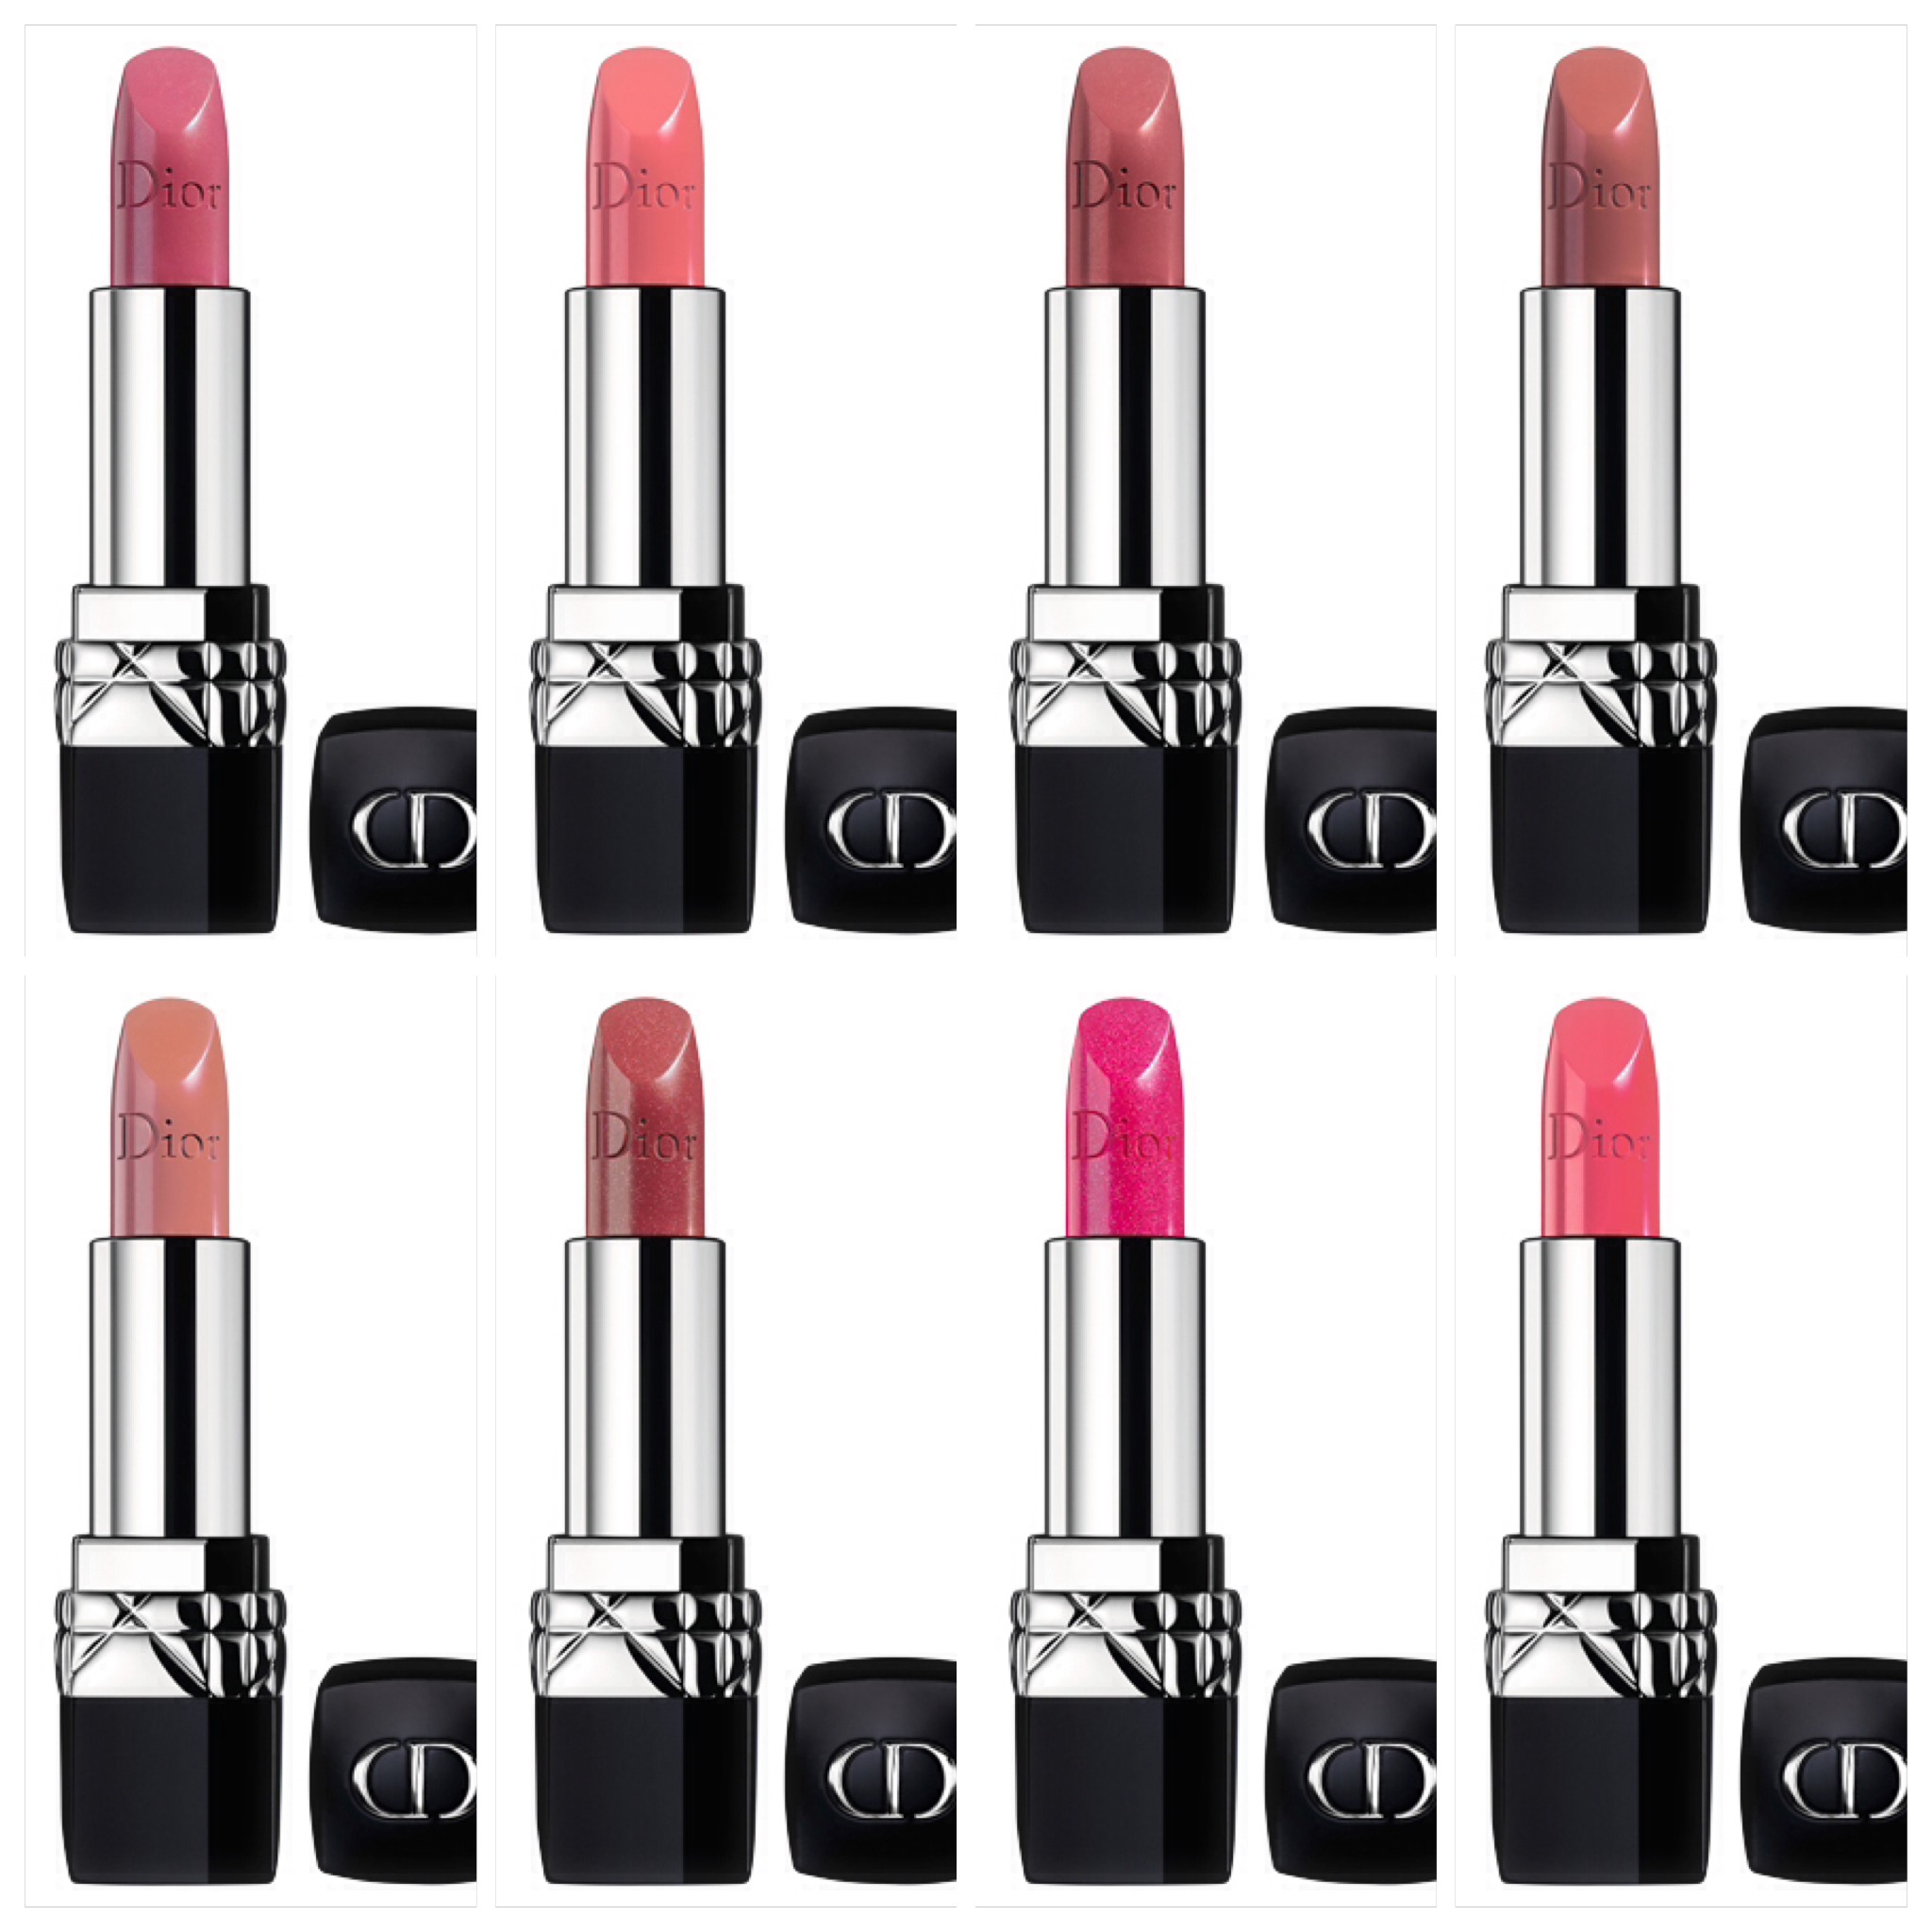 buy popular 89cbf 3f9a1 9月2日発売!Dior 新色『ルージュ ディオール』【リーク情報 ...